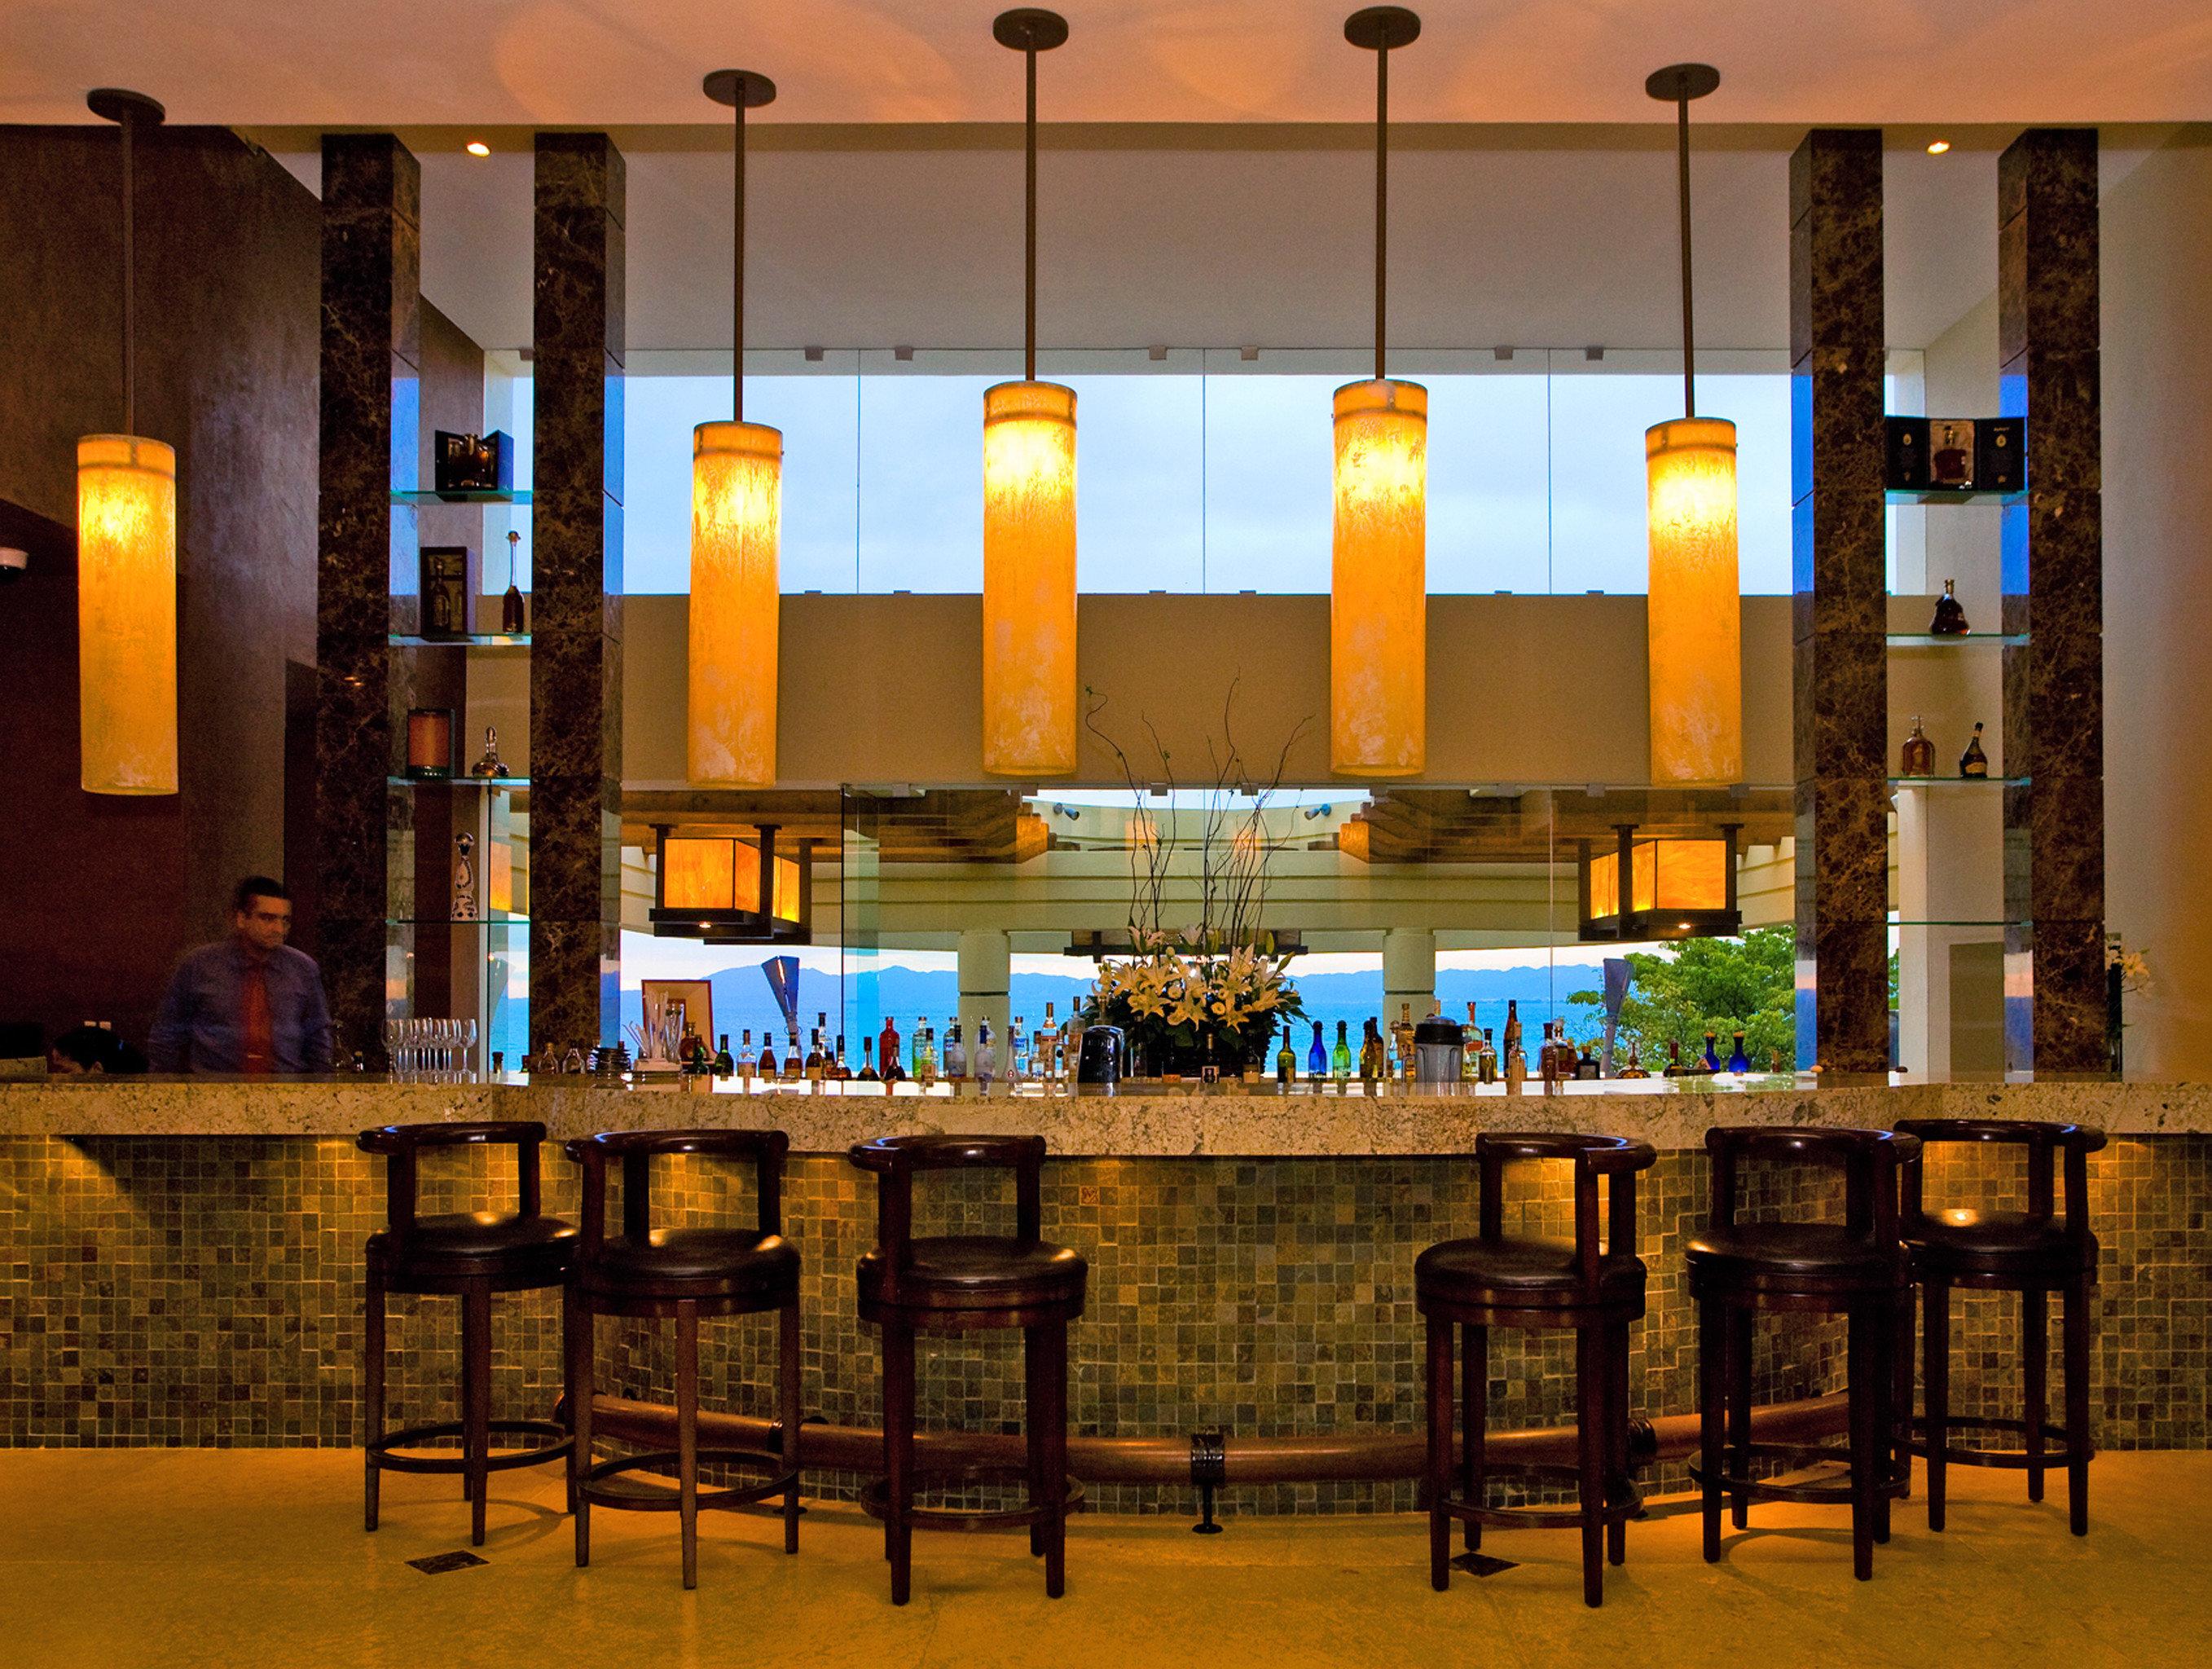 Bar restaurant function hall lighting Lobby palace convention center